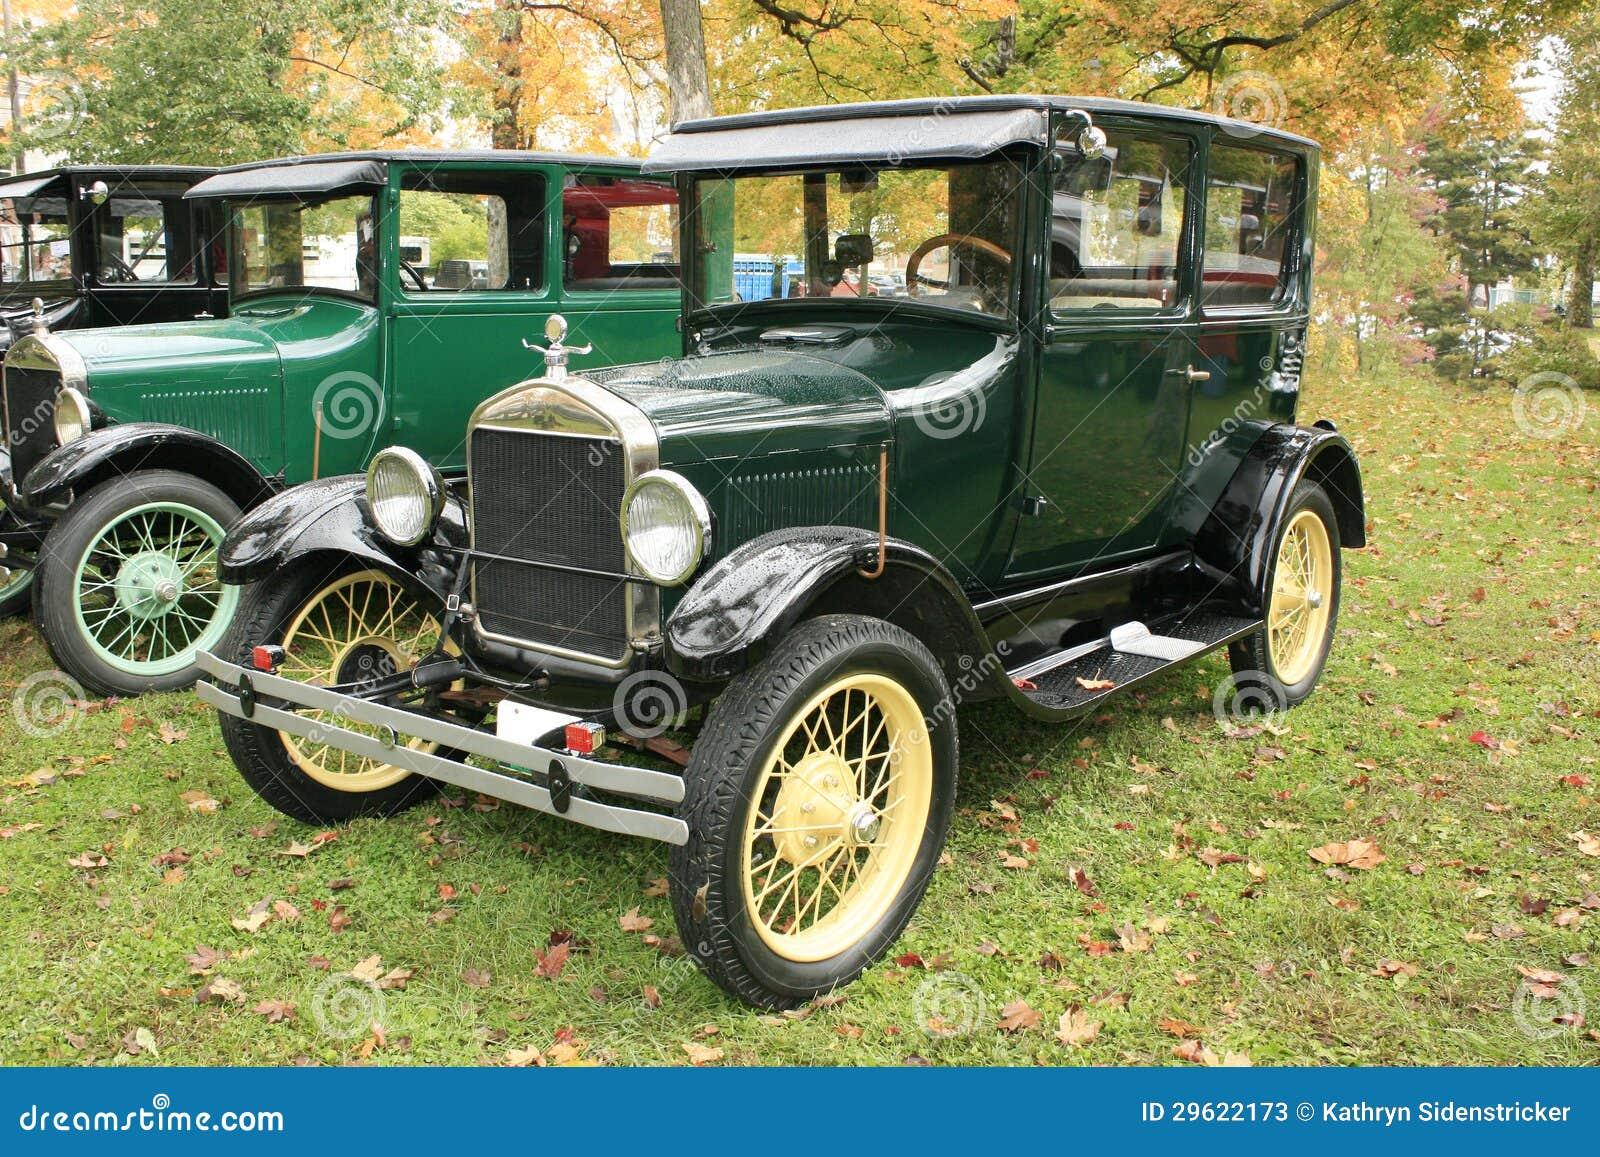 1927 model t ford two door sedan stock image image of for 1927 ford model t 4 door sedan